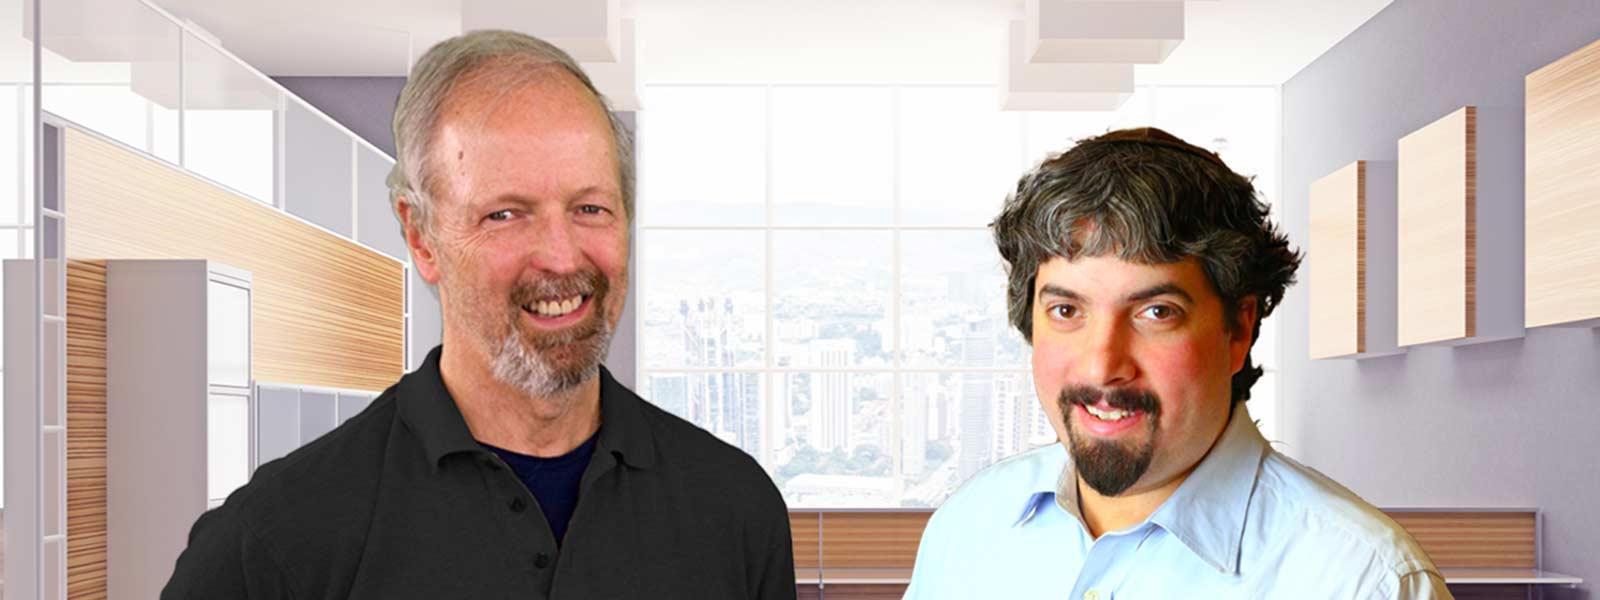 Eric Enge and Barry Schwartz